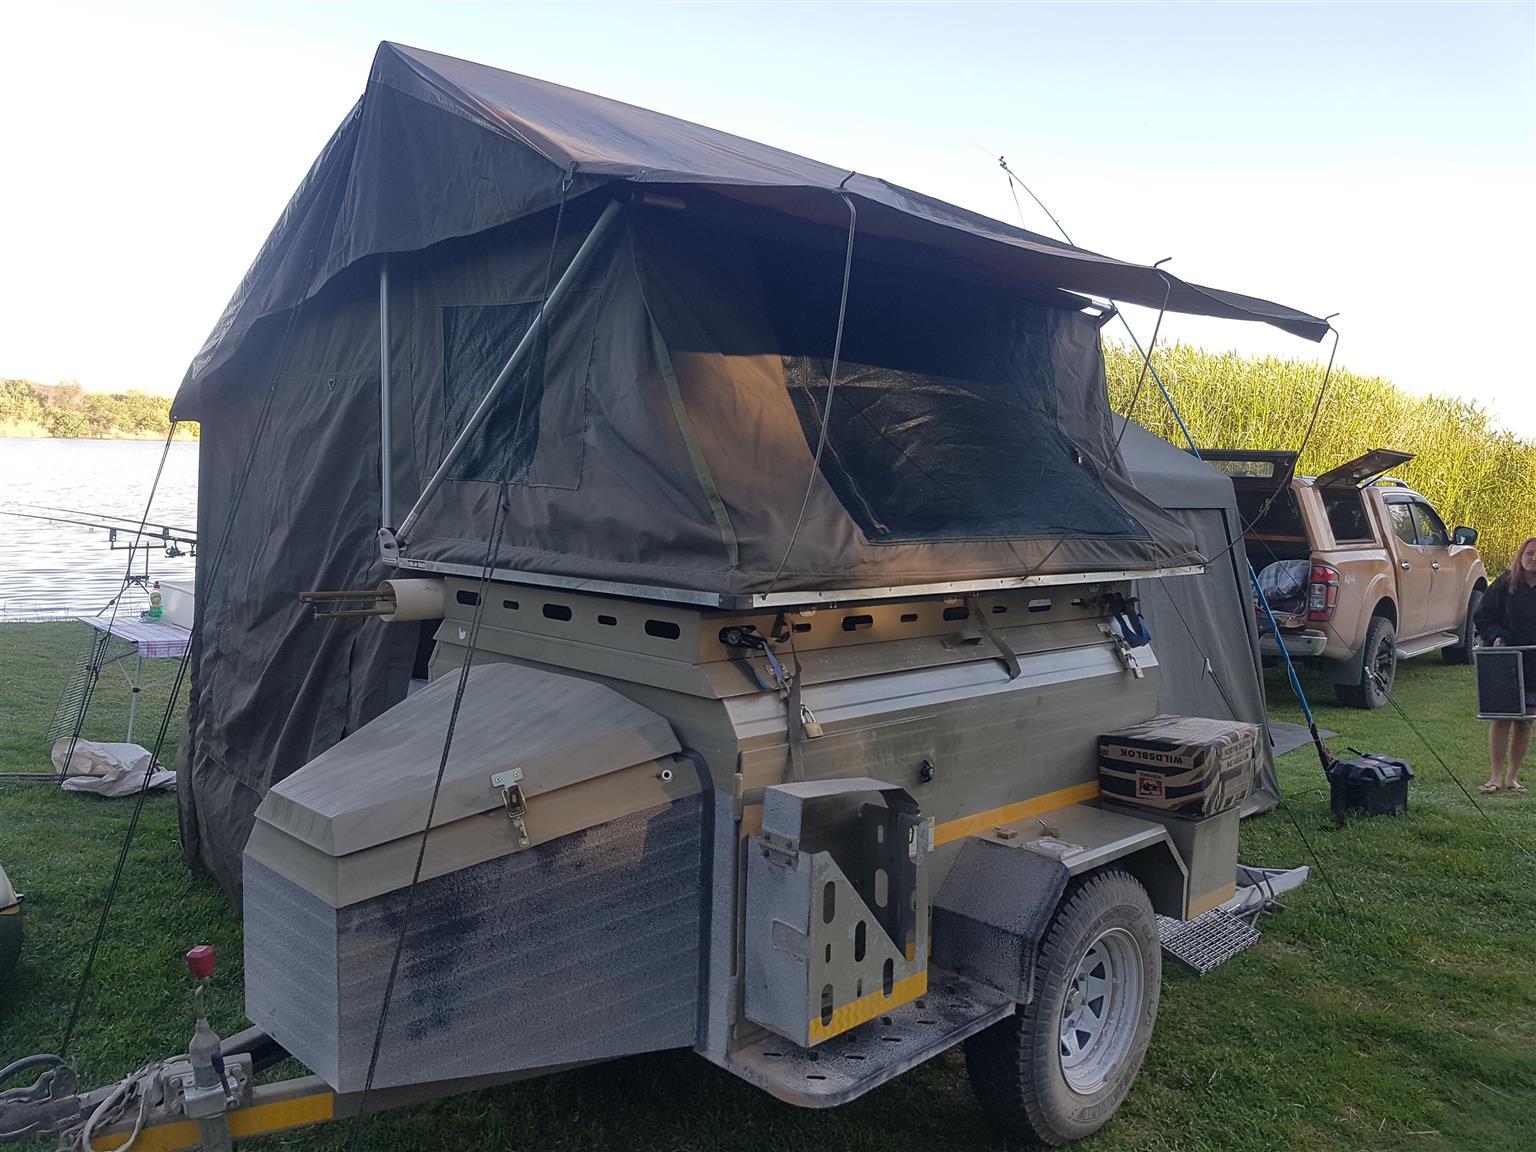 Wilderness 310 6 foot Challenger trailer with tent